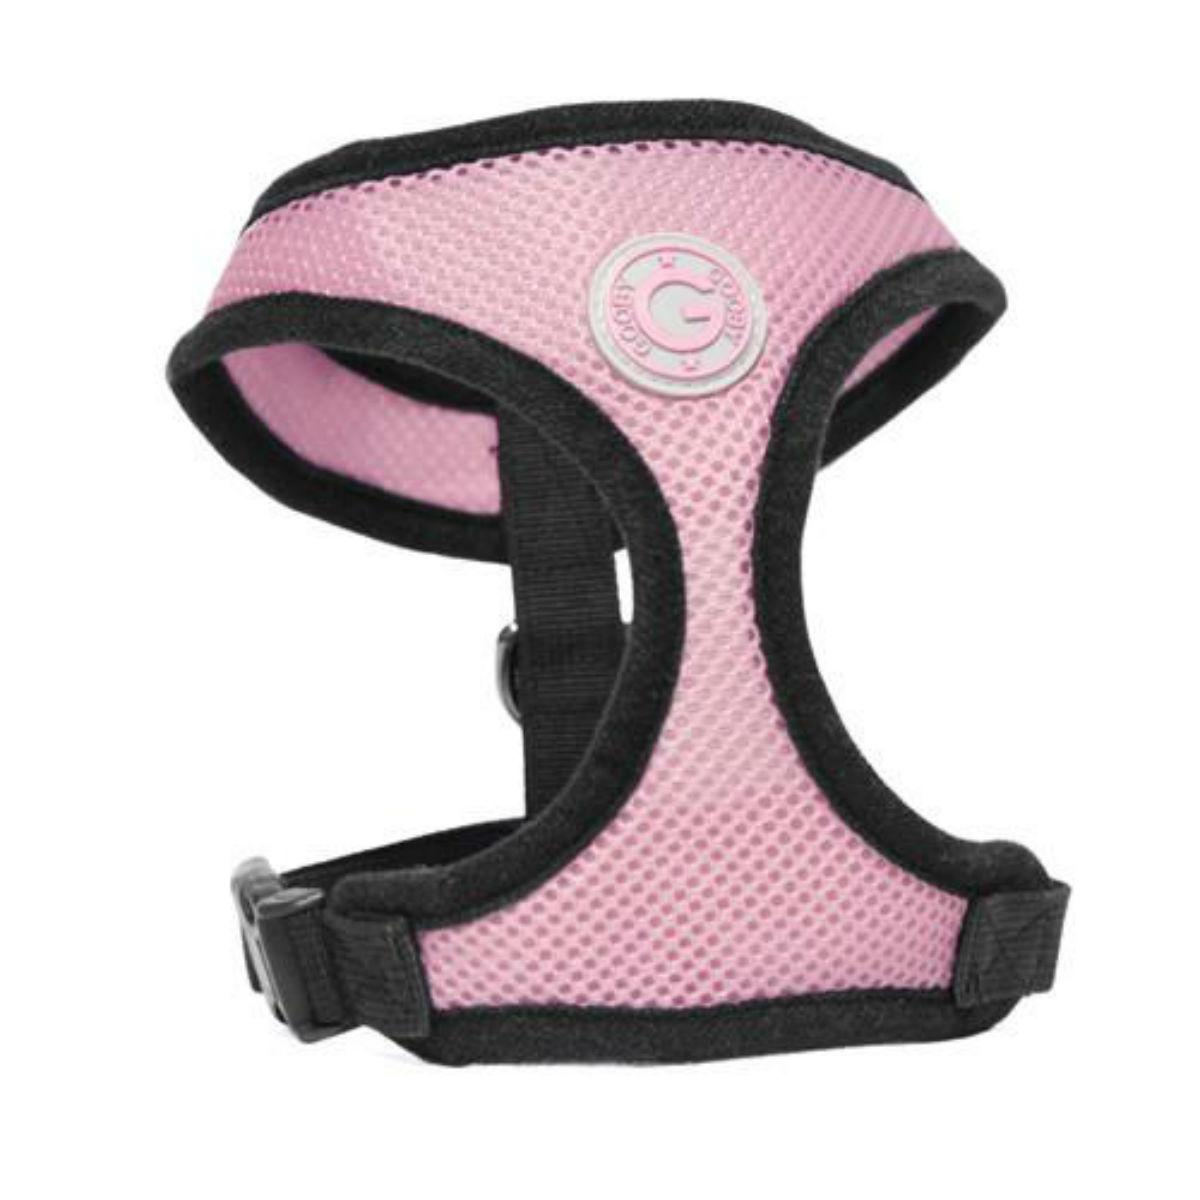 Gooby Soft Mesh Dog Harness - Pink